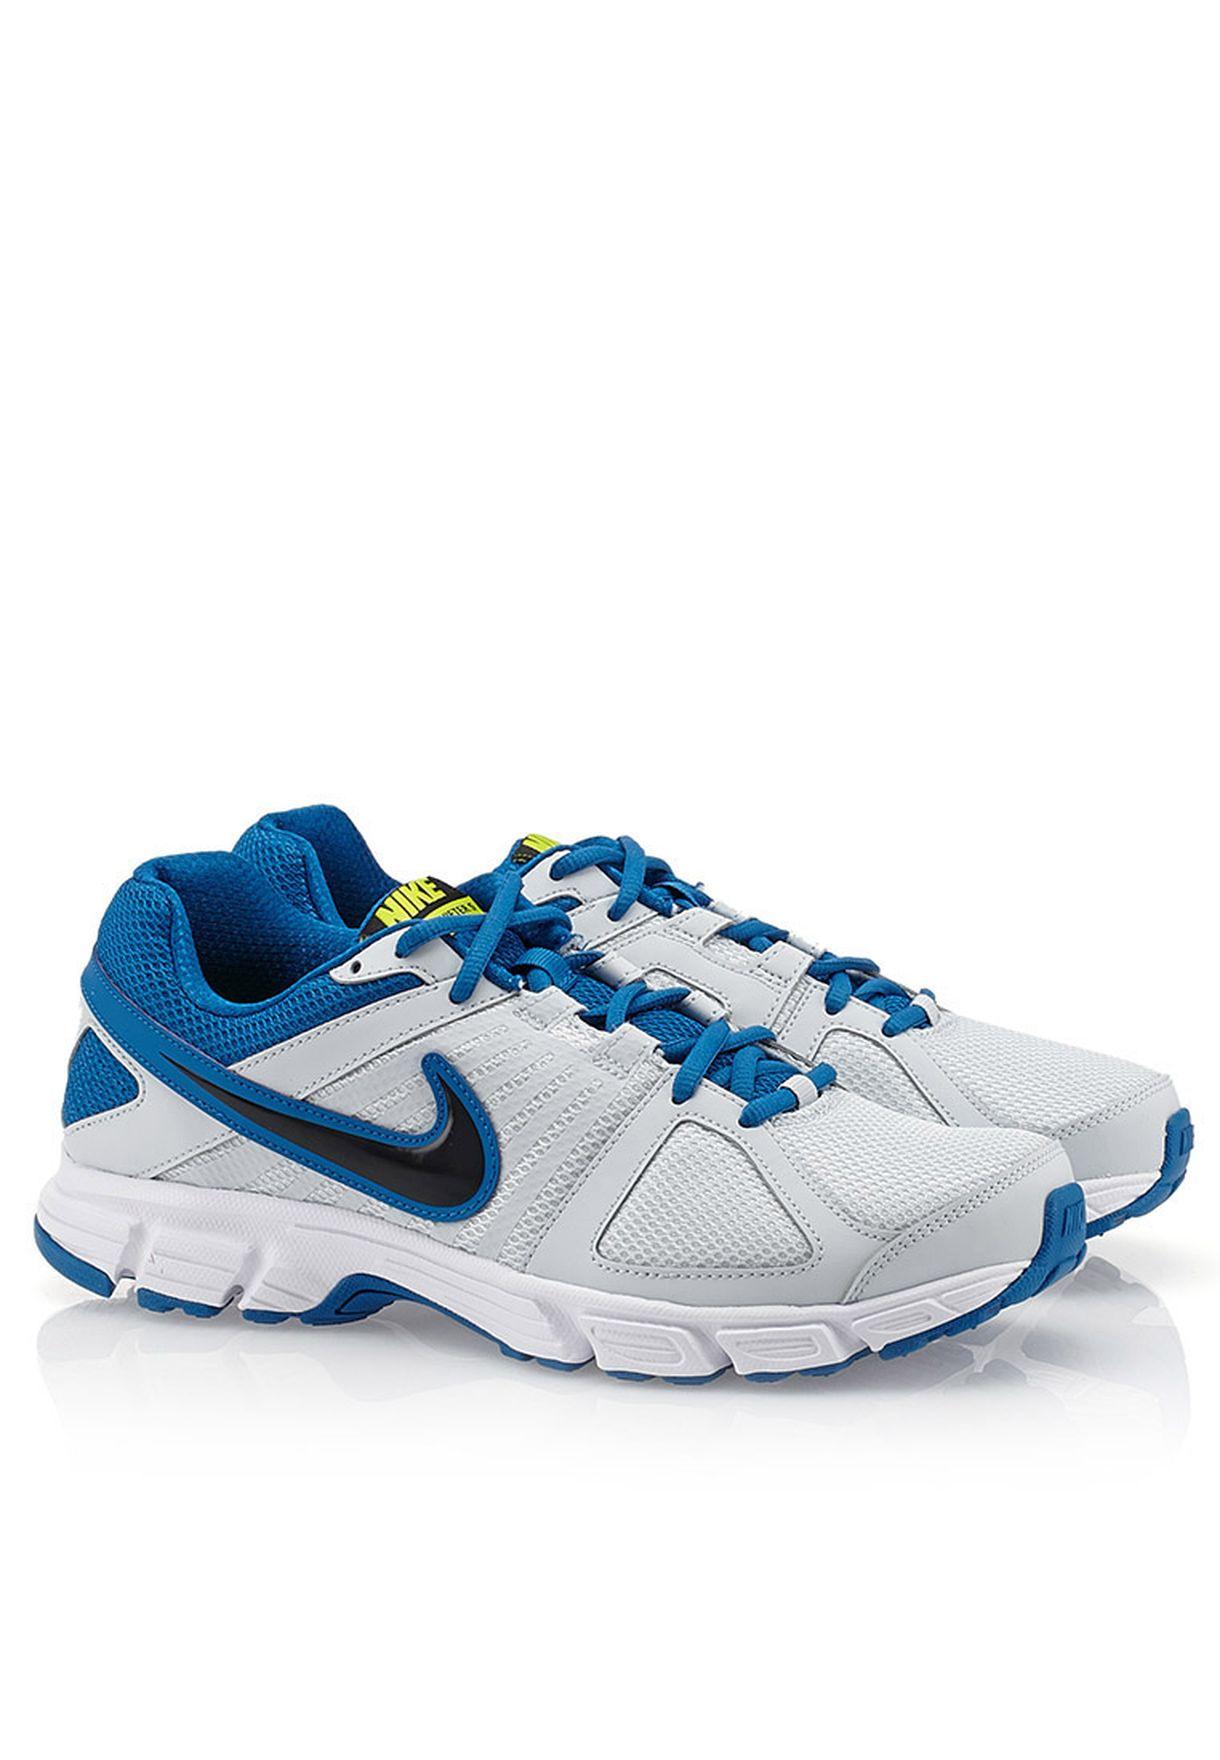 bd4d2637a60 Shop Nike white Nike Downshifter 5 MSL 538258-028 for Men in UAE ...